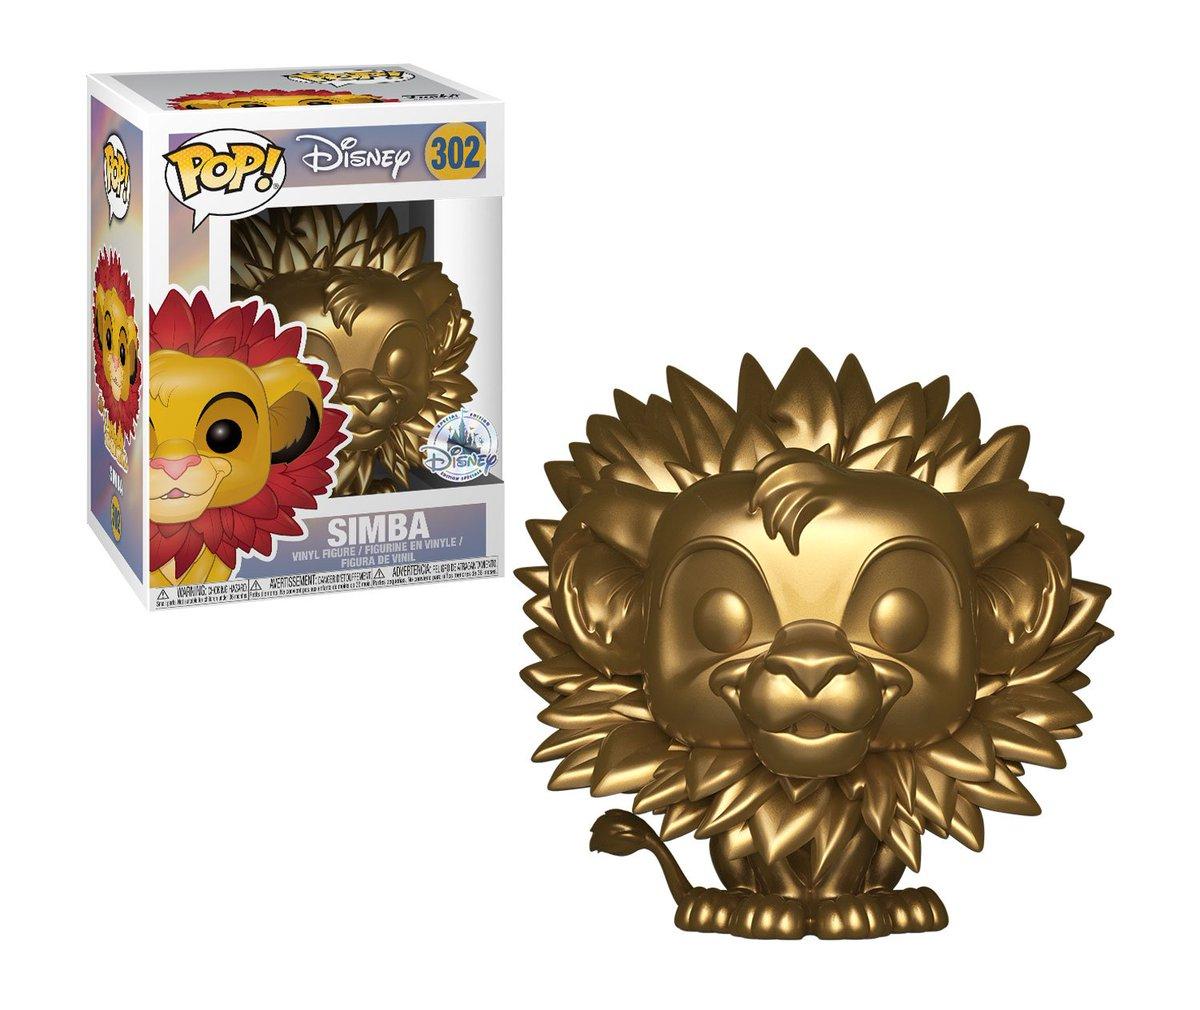 RT & follow @OriginalFunko for a chance to WIN an exclusive Gold Simba Pop!